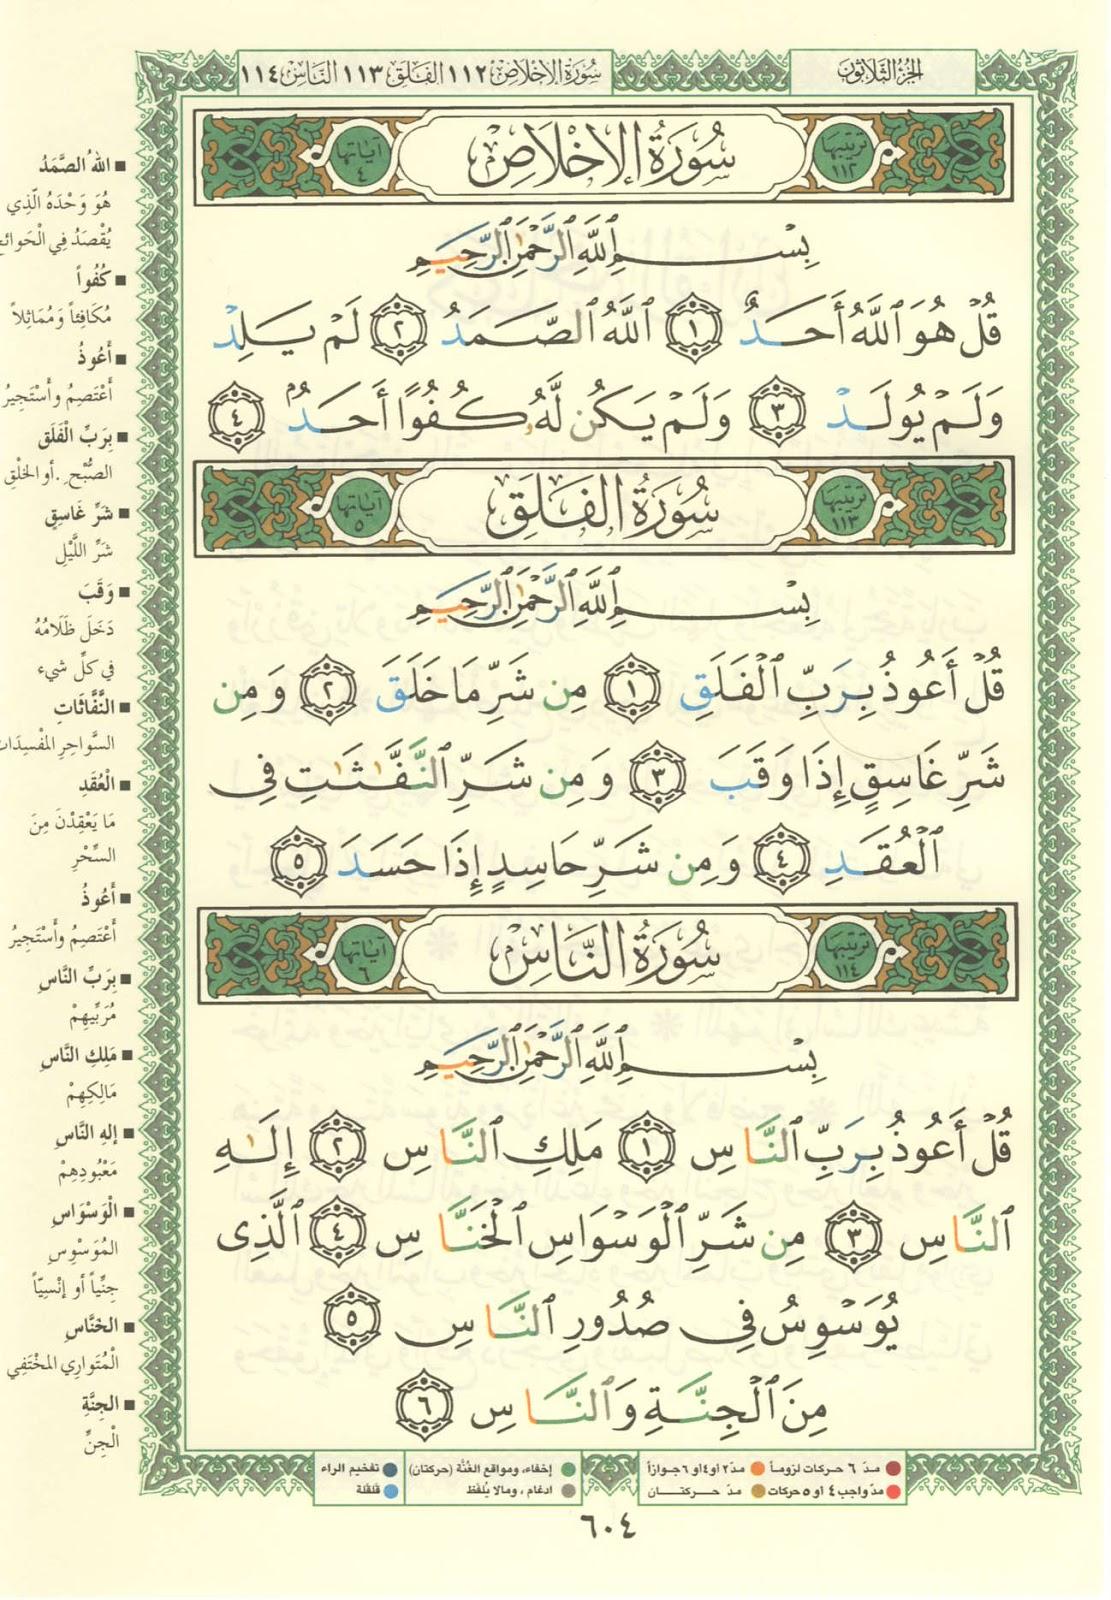 National Day Of Reconciliation ⁓ The Fastest Juz Amma Al Quran